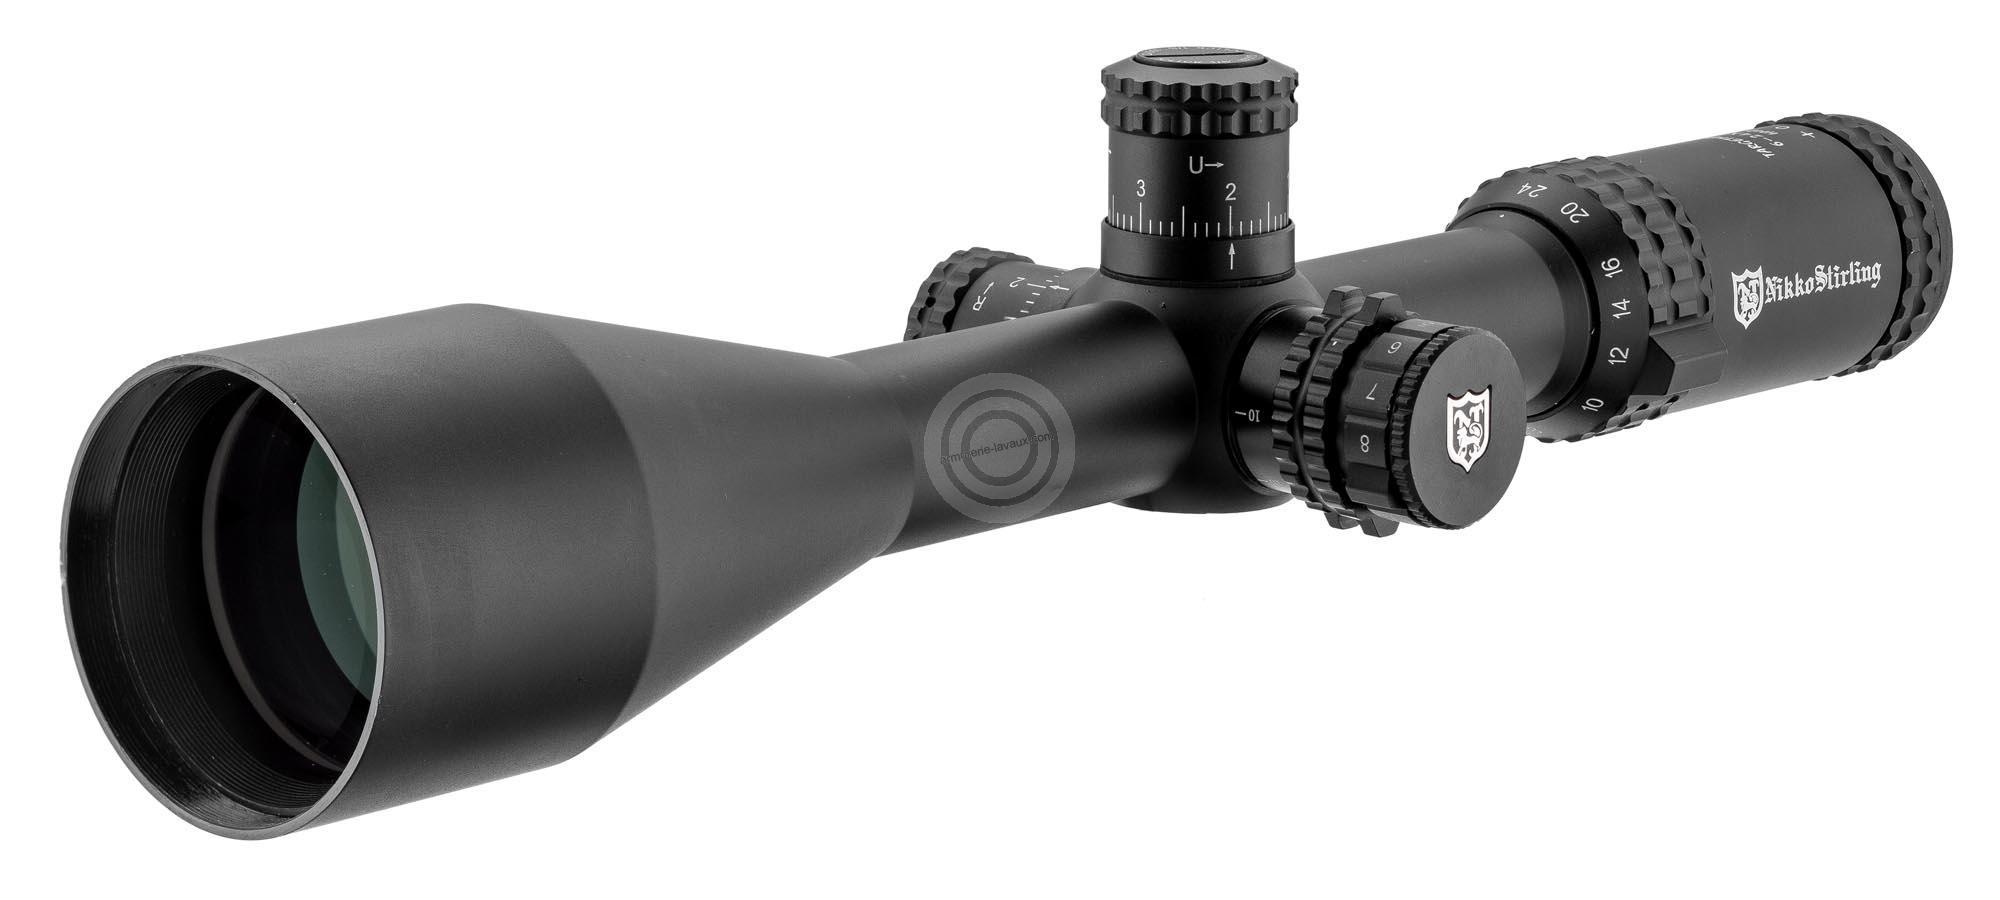 lunette de tir nikko stirling target master 6 24x56 mildot carabines de tir sur armurerie lavaux. Black Bedroom Furniture Sets. Home Design Ideas